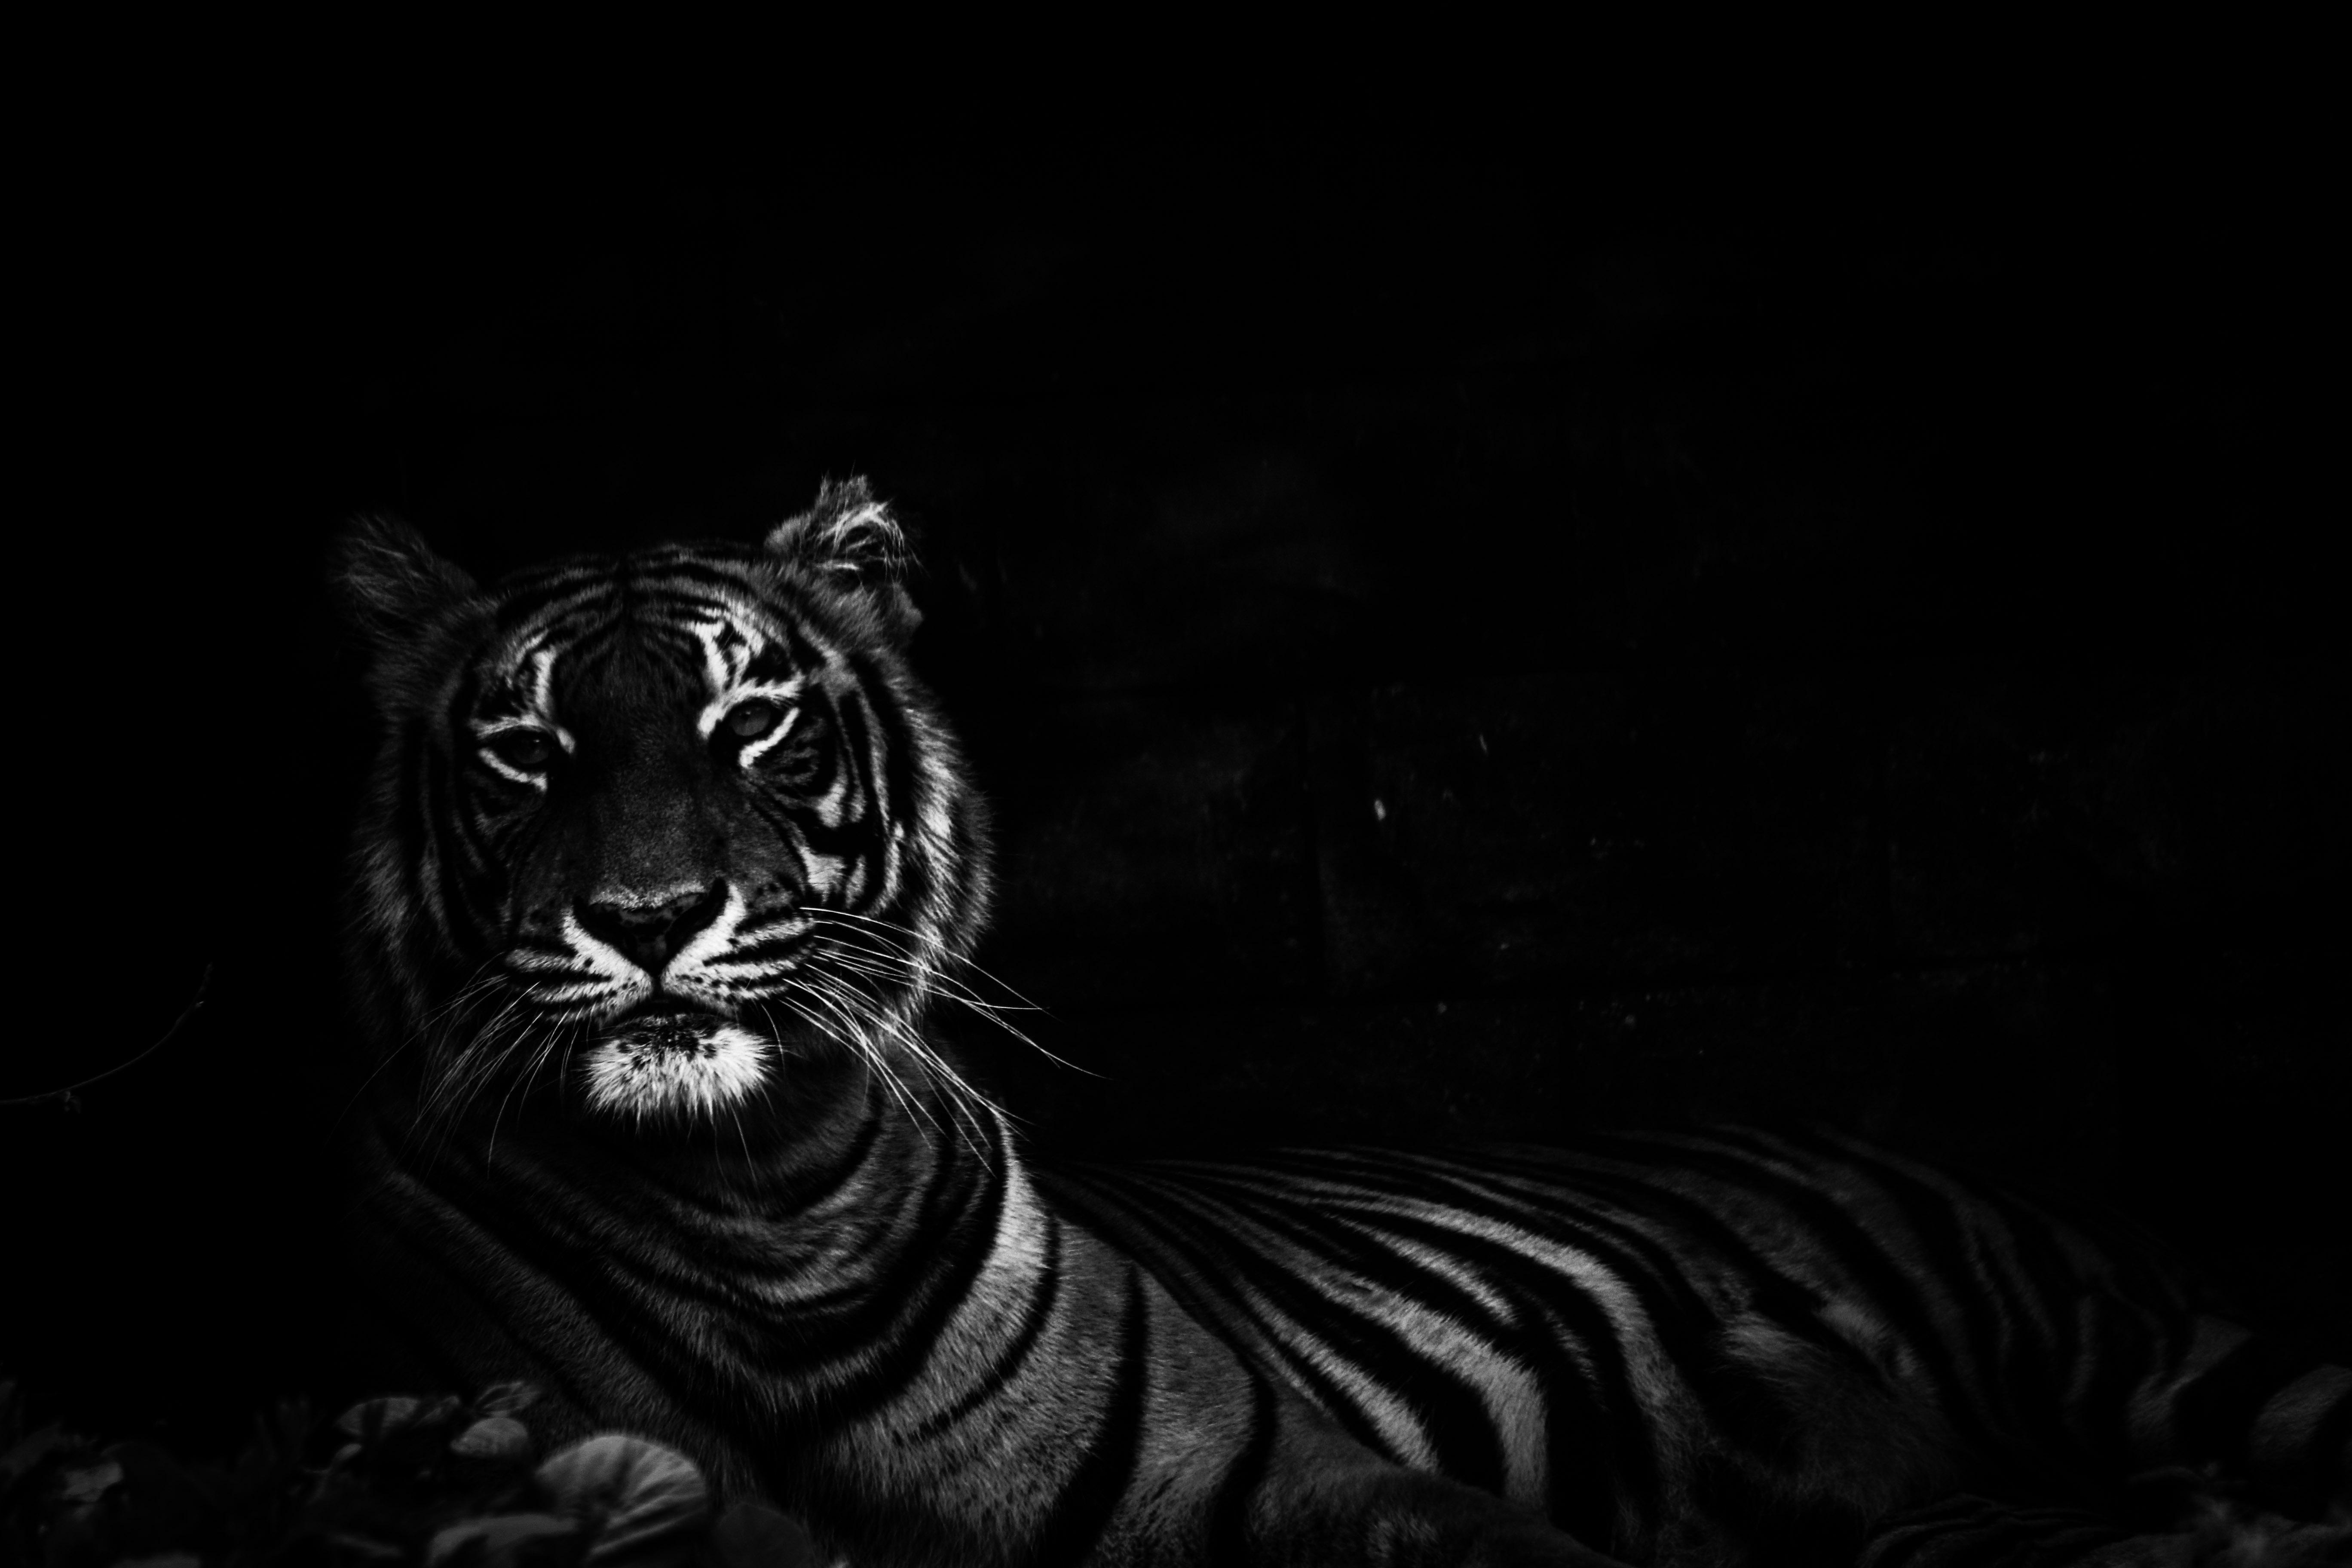 Lion Animal Wallpaper Free Stock Photo Of Animal Black Black Background